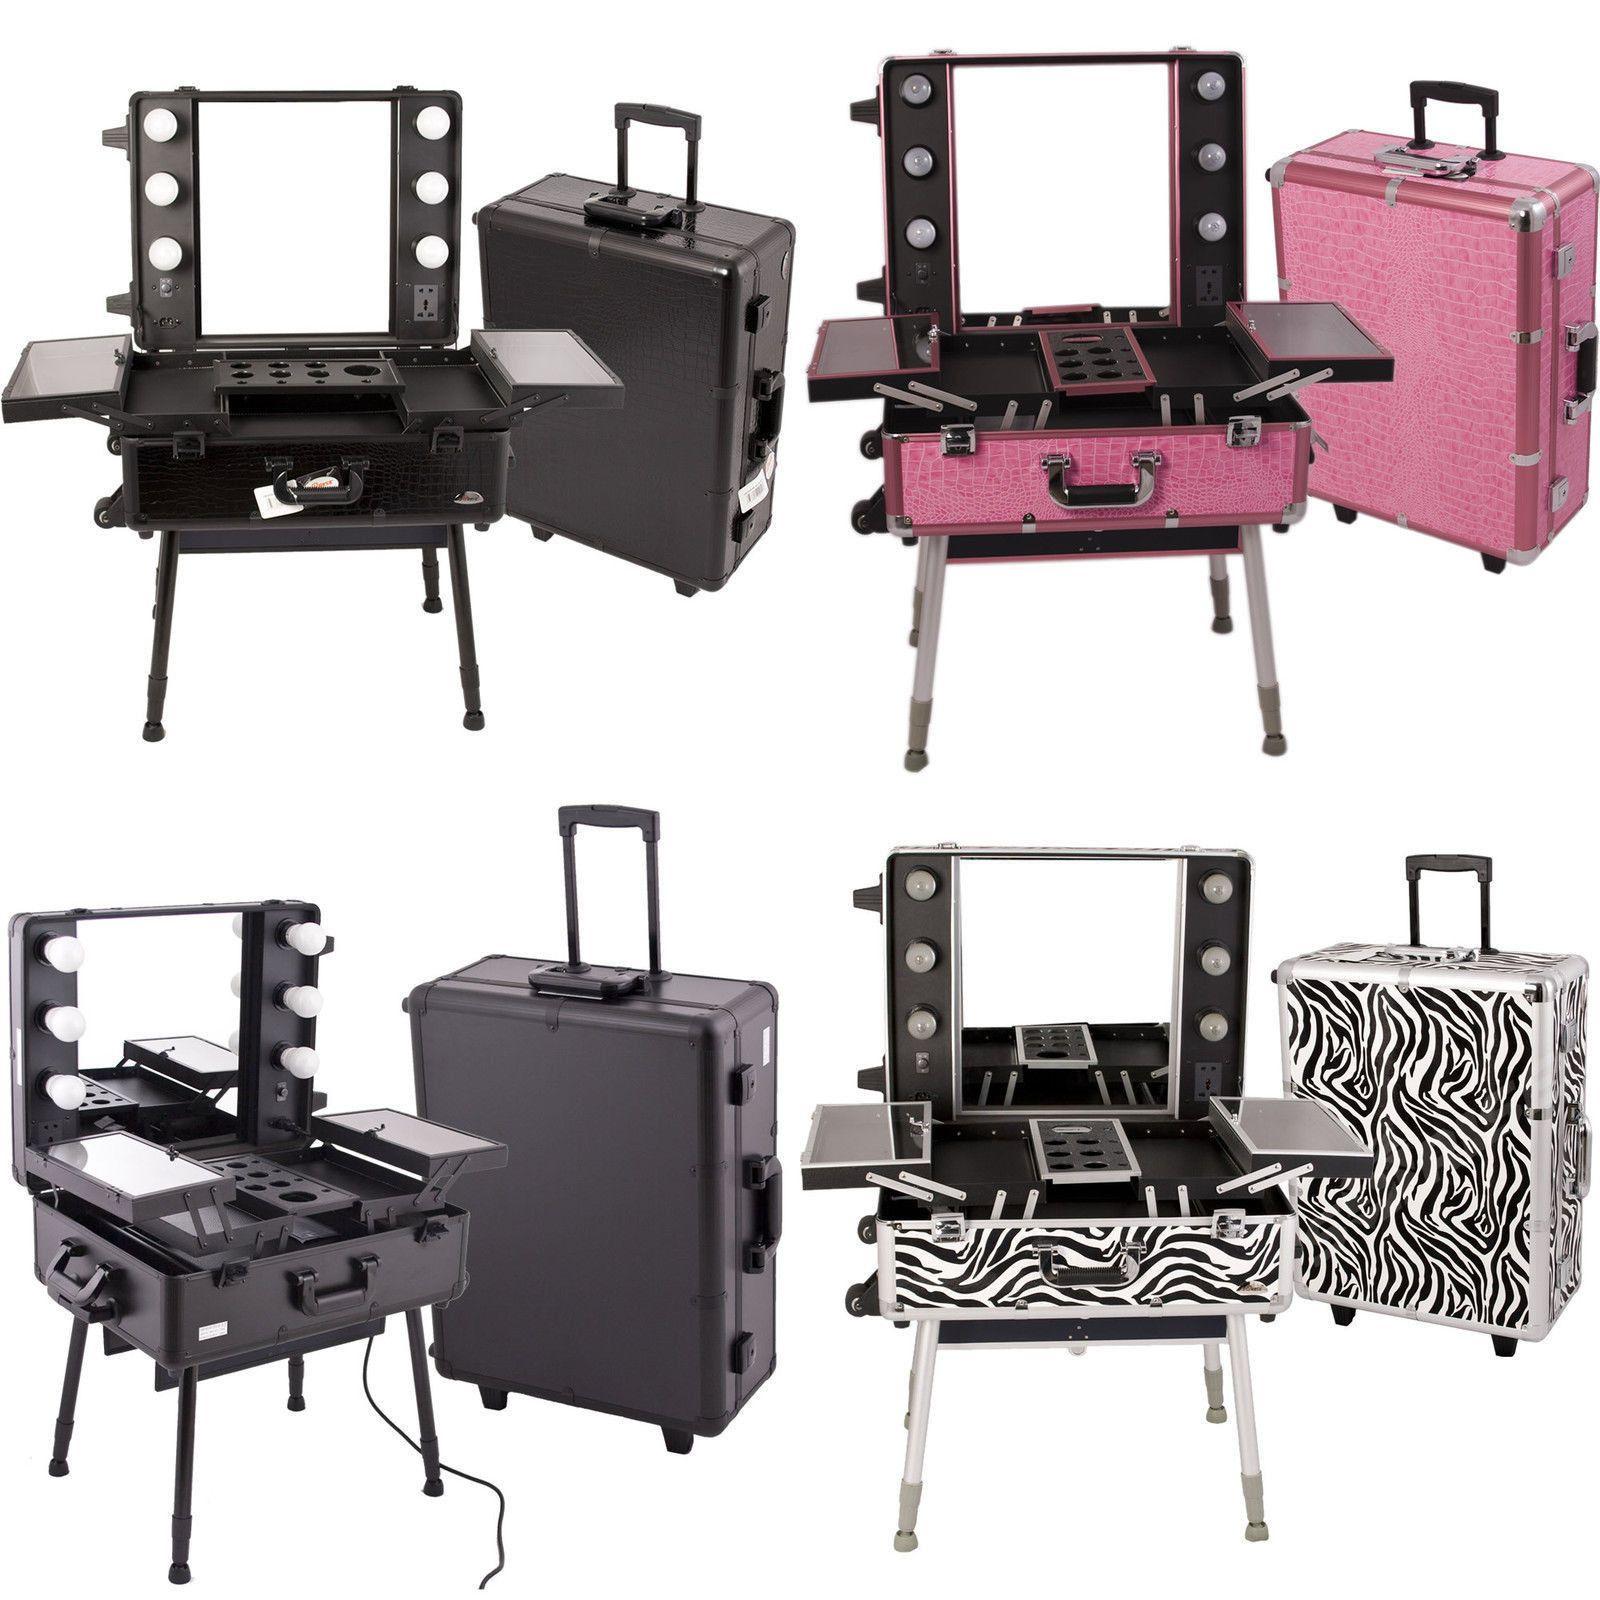 Makeup Studio Portable Cosmetic Rolling Station Case w Mirror 6 CFL Light C6010 | eBay